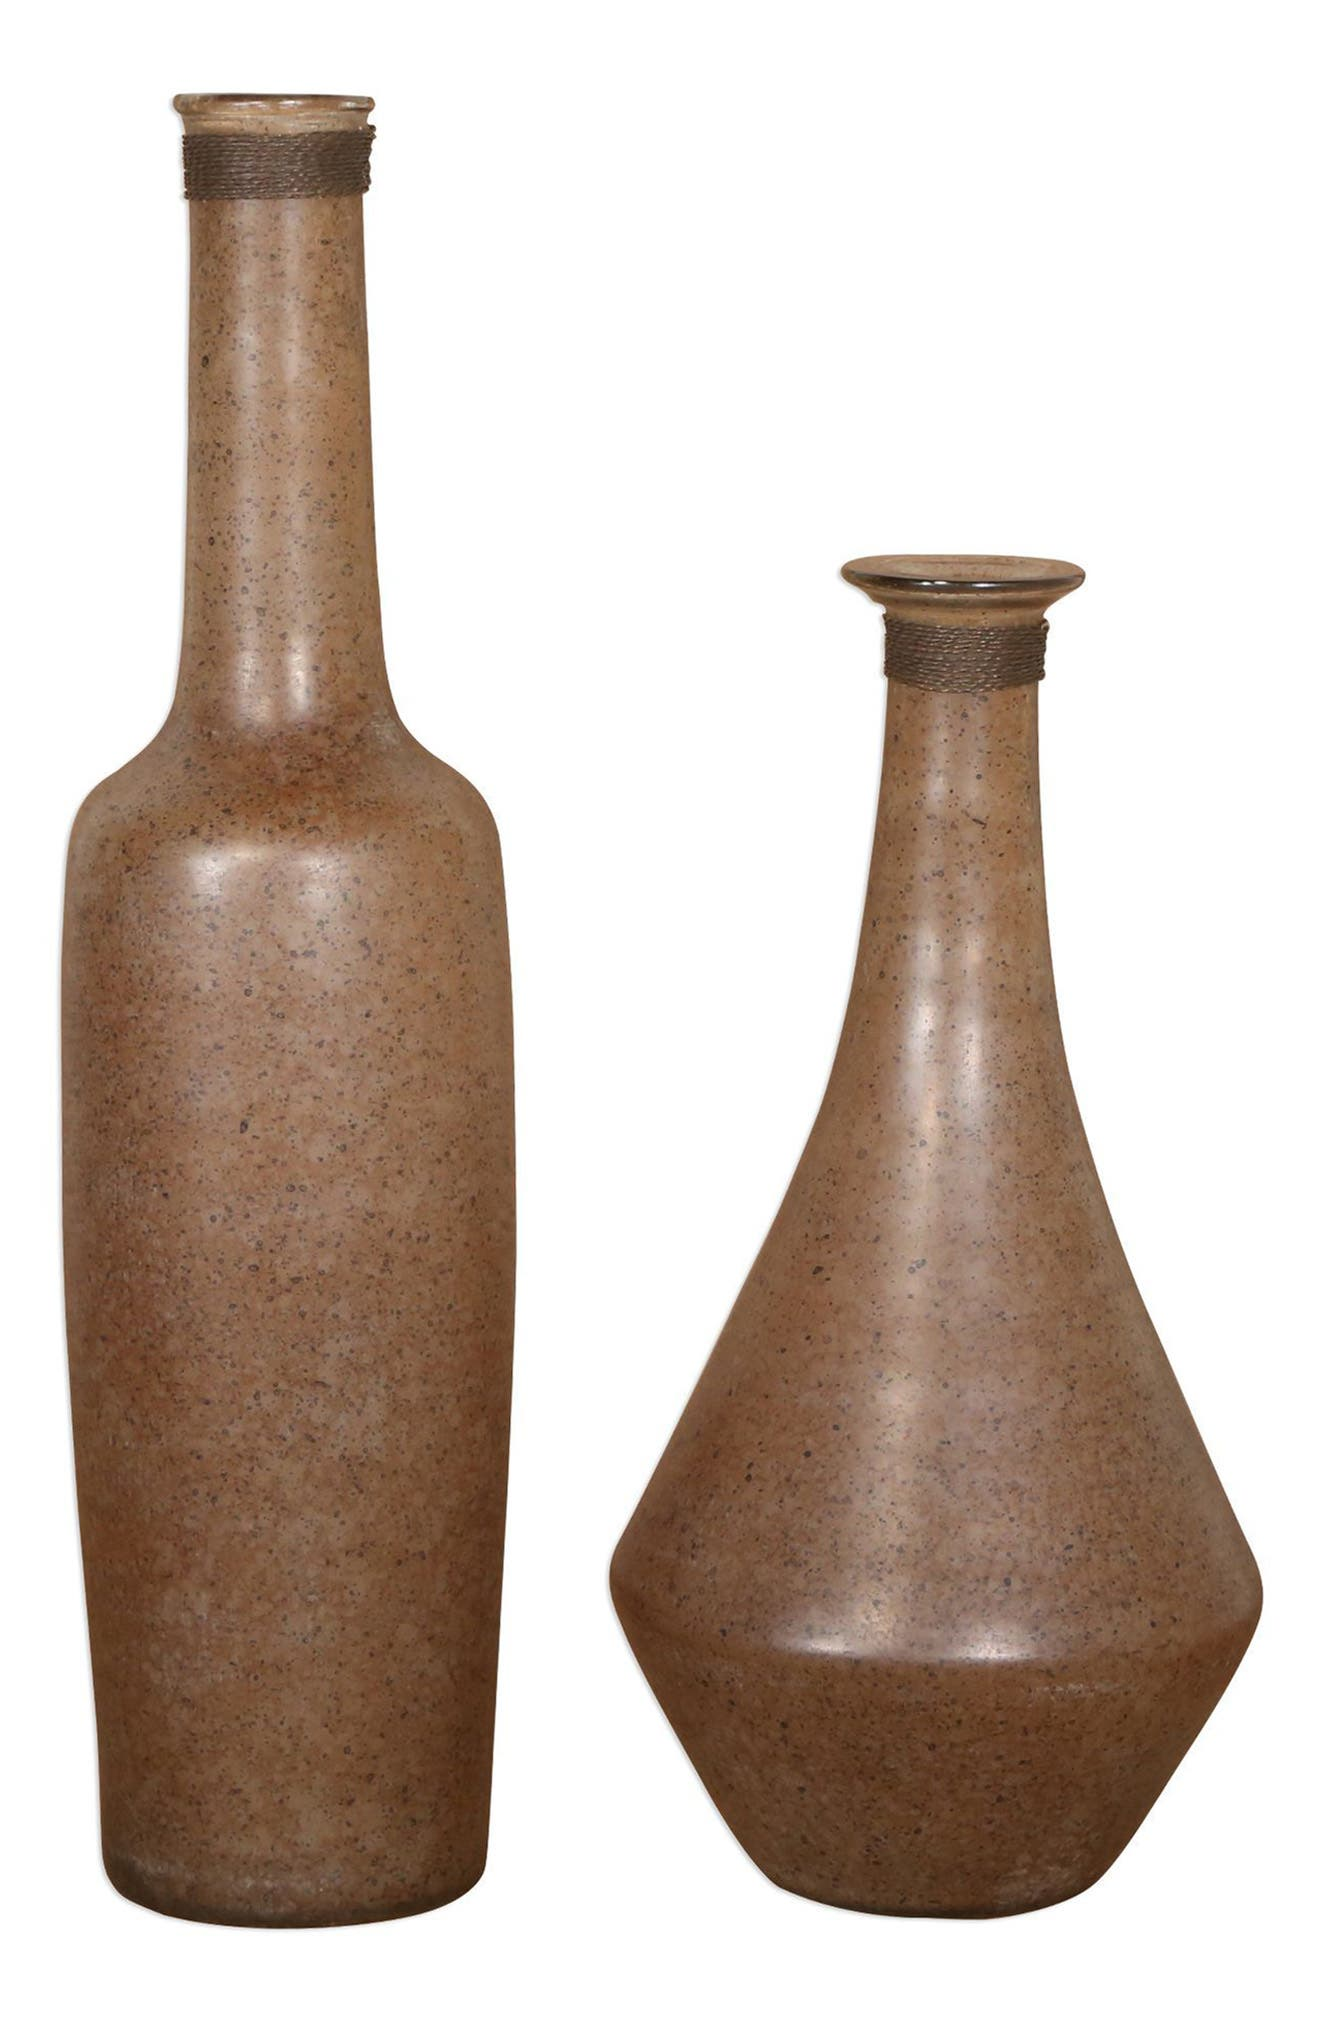 Main Image - Uttermost Chandi Set of 2 Vases